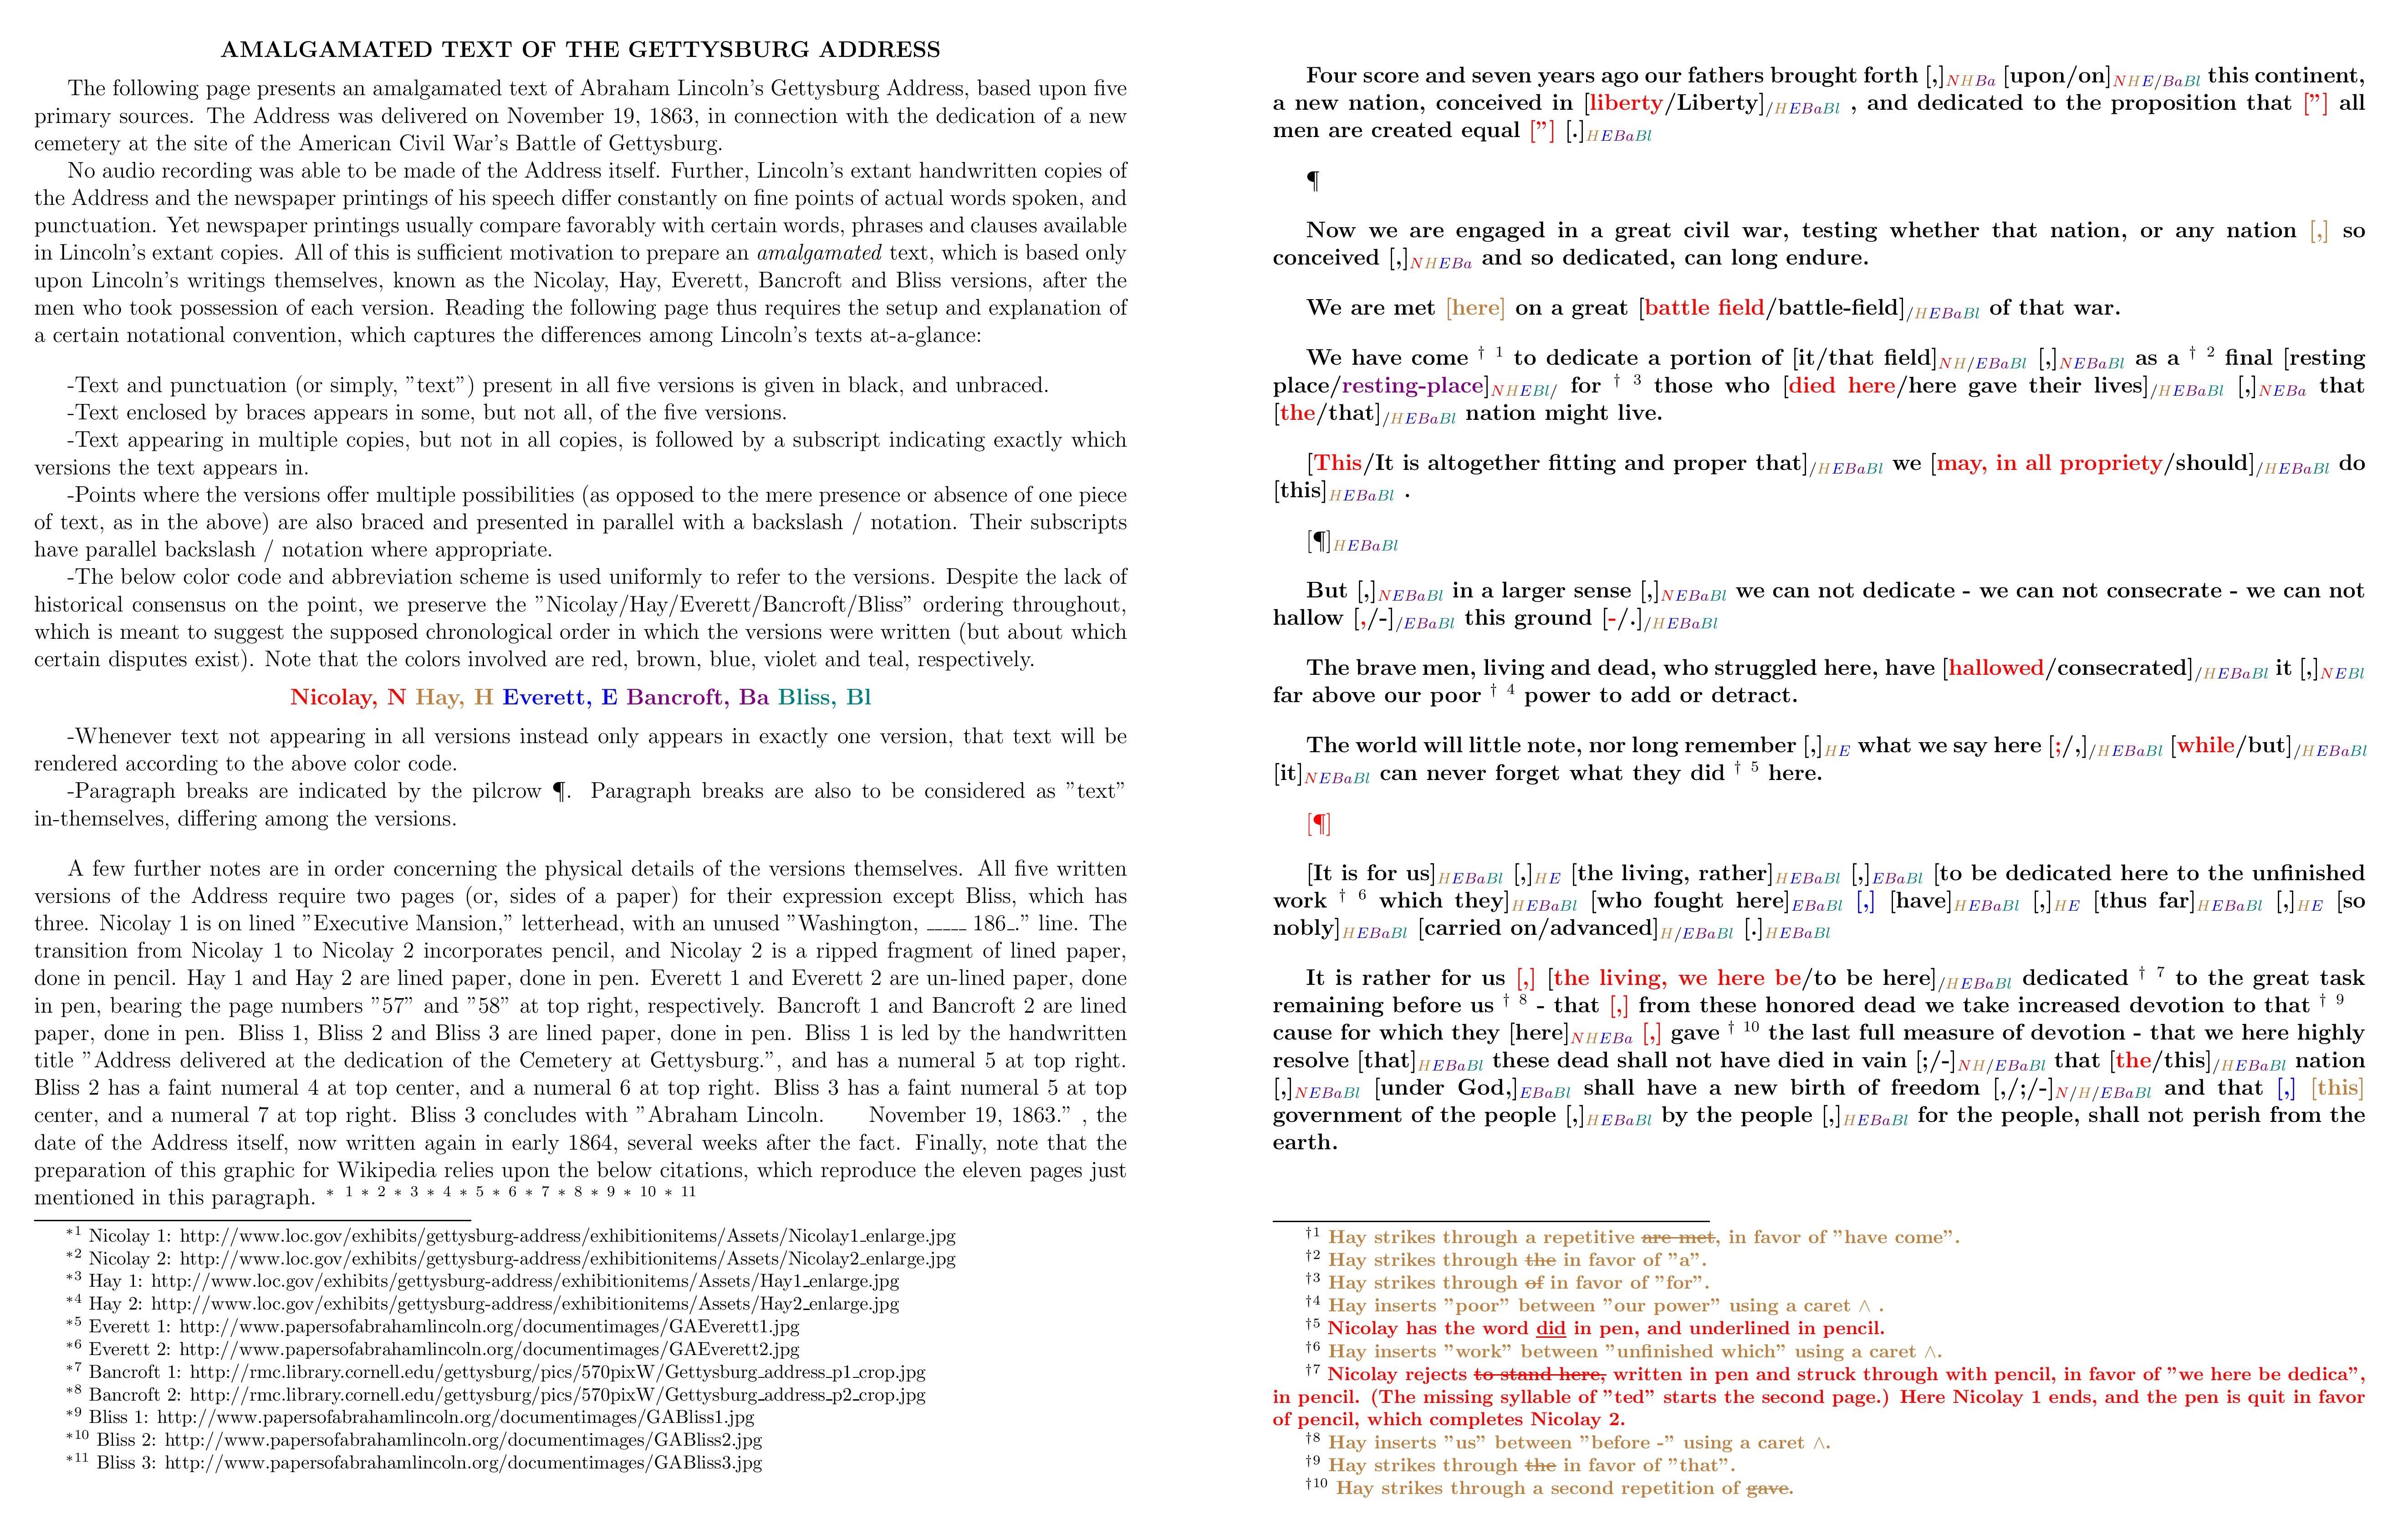 Gettysburg Addres Wikiwand Paraphrased Sentences